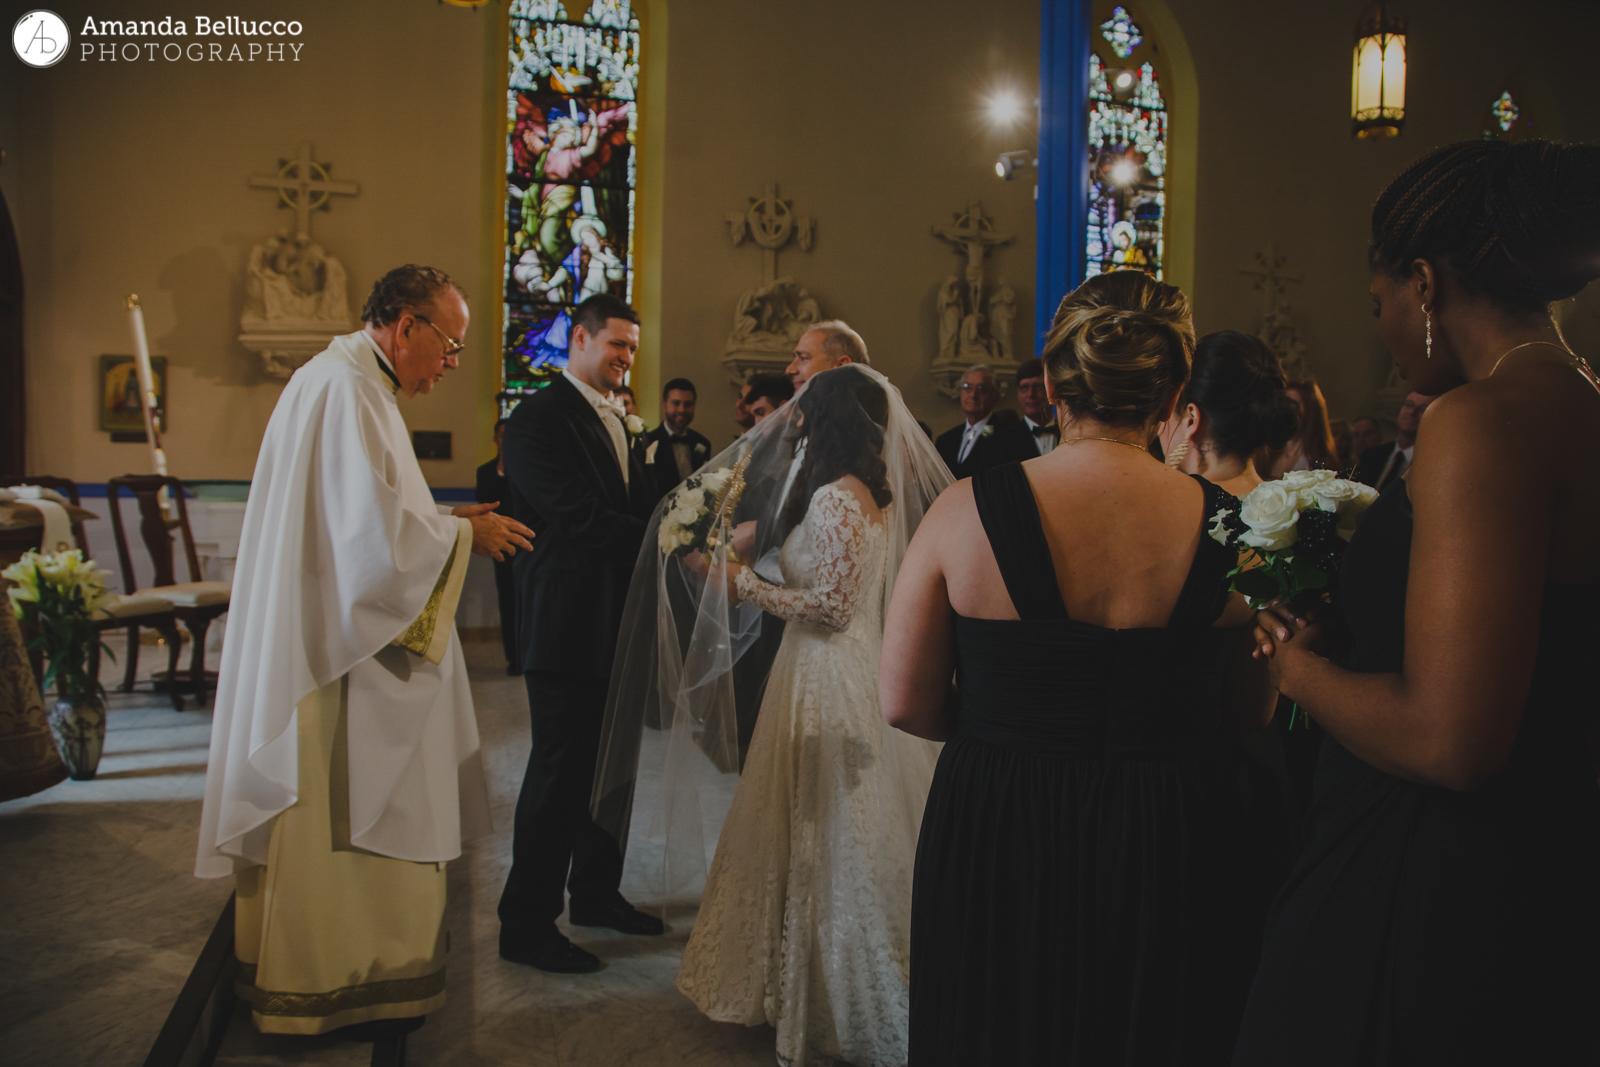 syracuse-rochester-fine-art-wedding-photographer-32.JPG